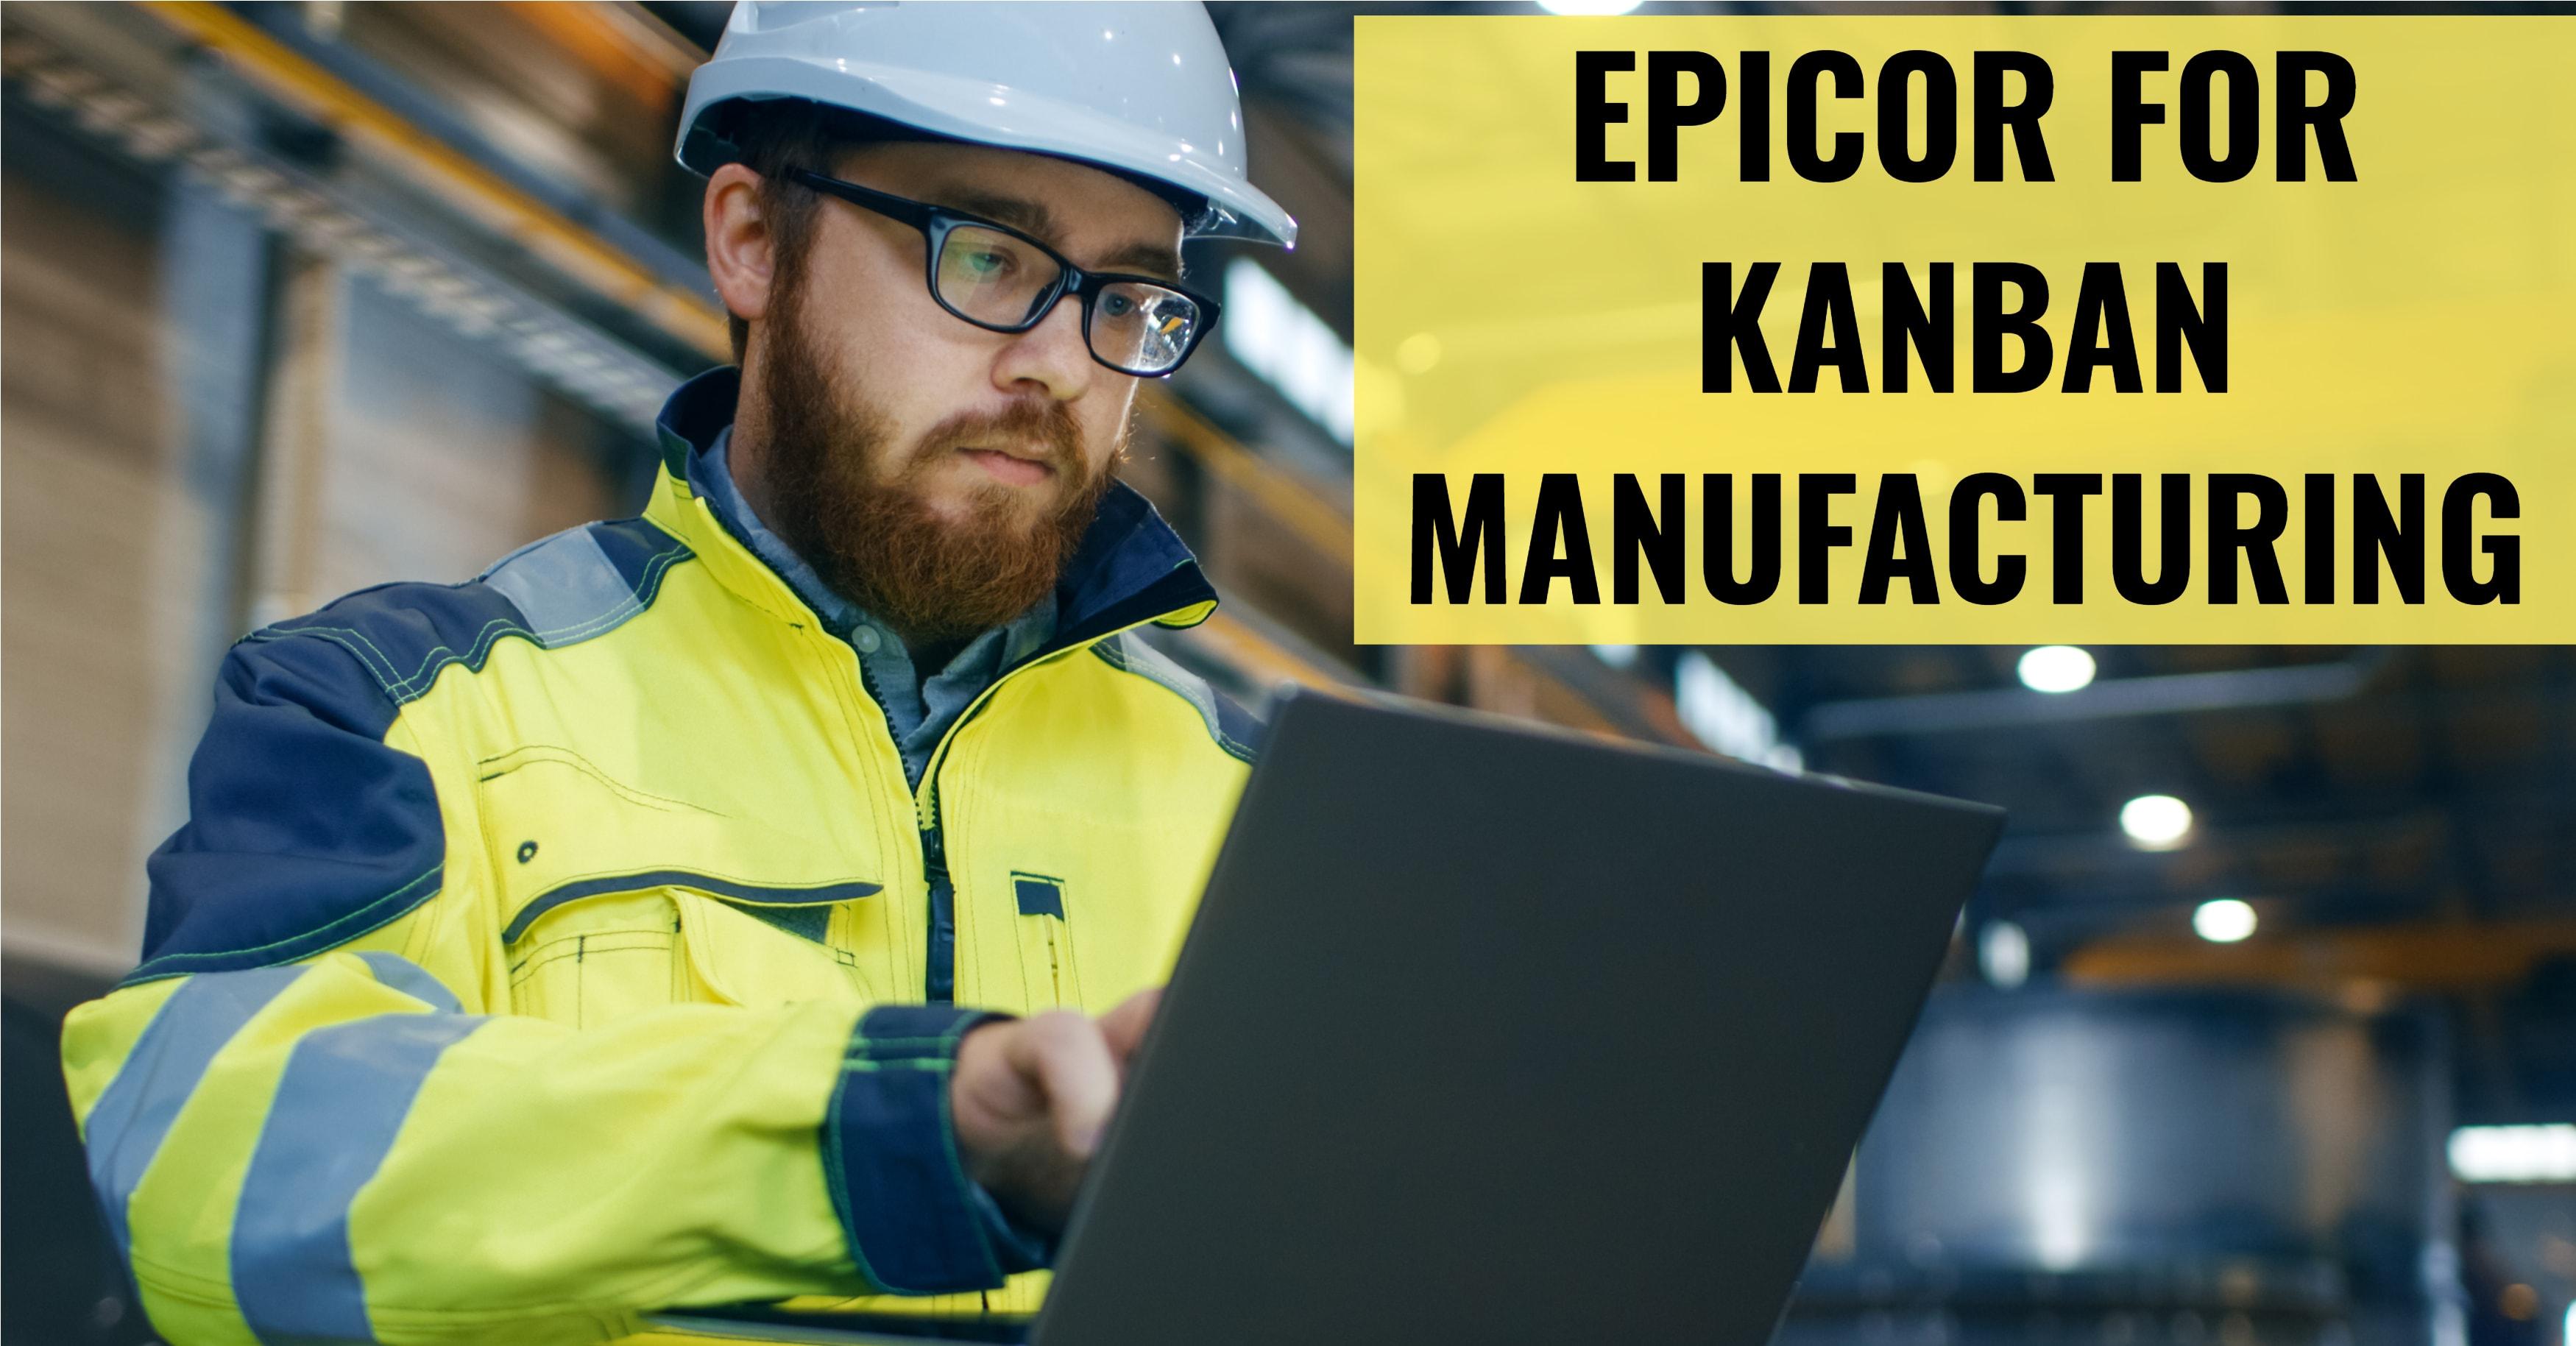 Epicor ERP Kanban